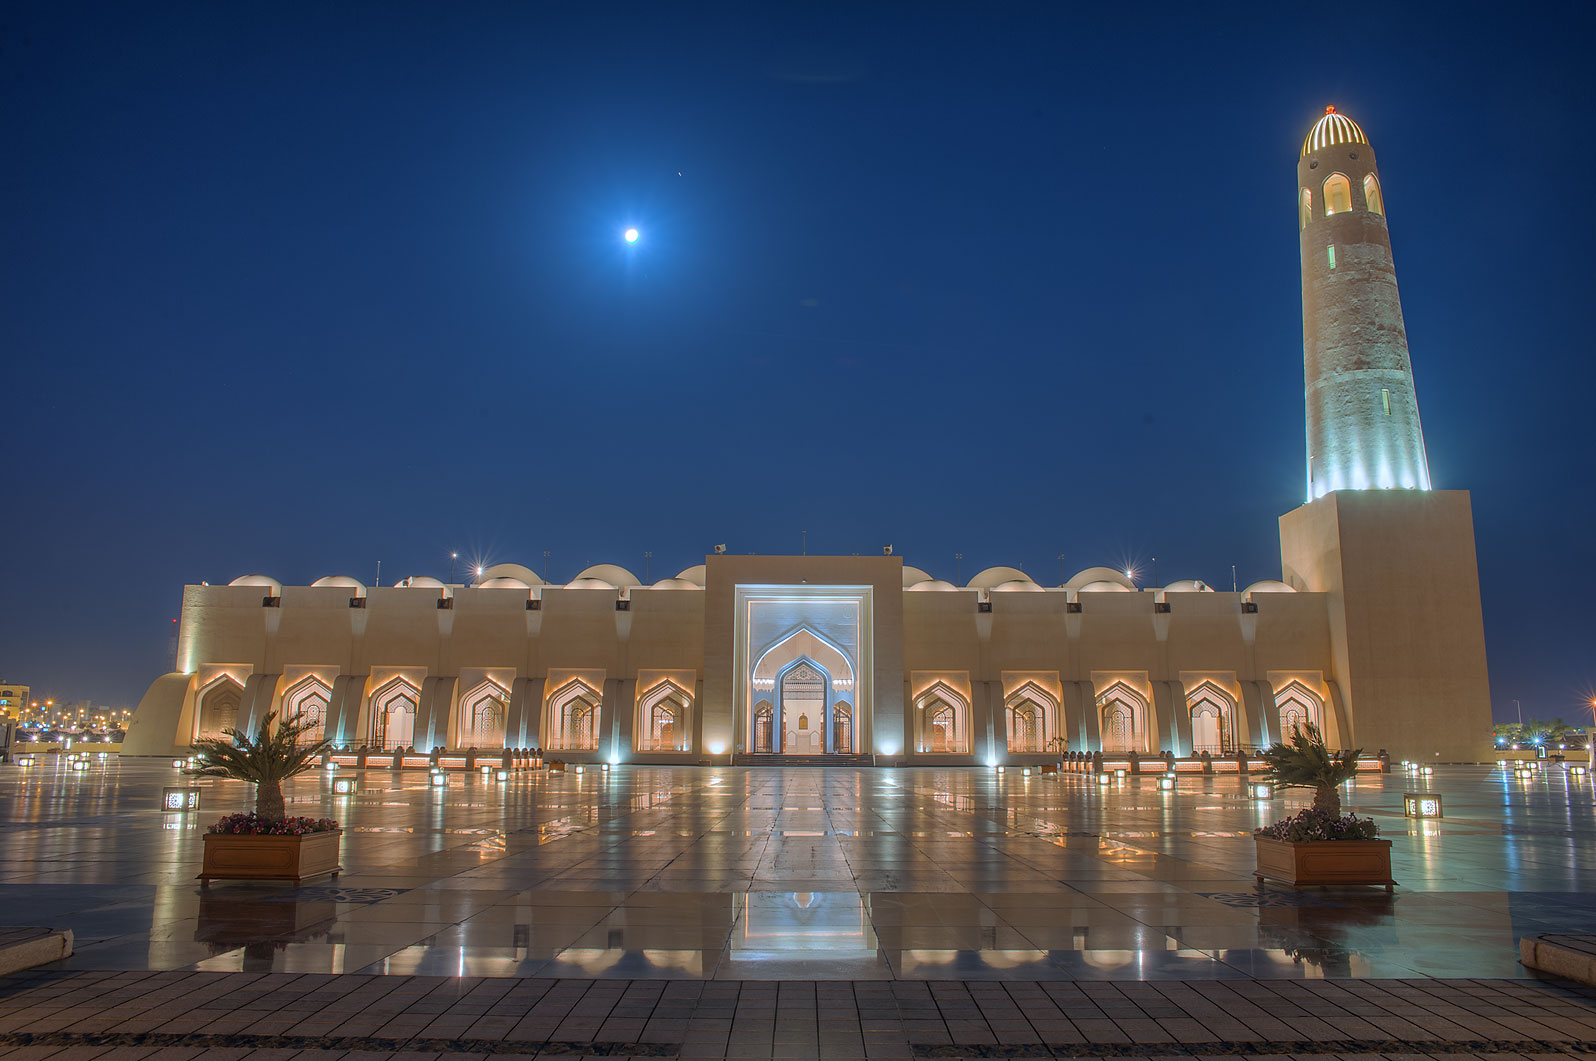 Photo 1378 10 State Mosque Sheikh Muhammad Ibn Abdul Wahhab